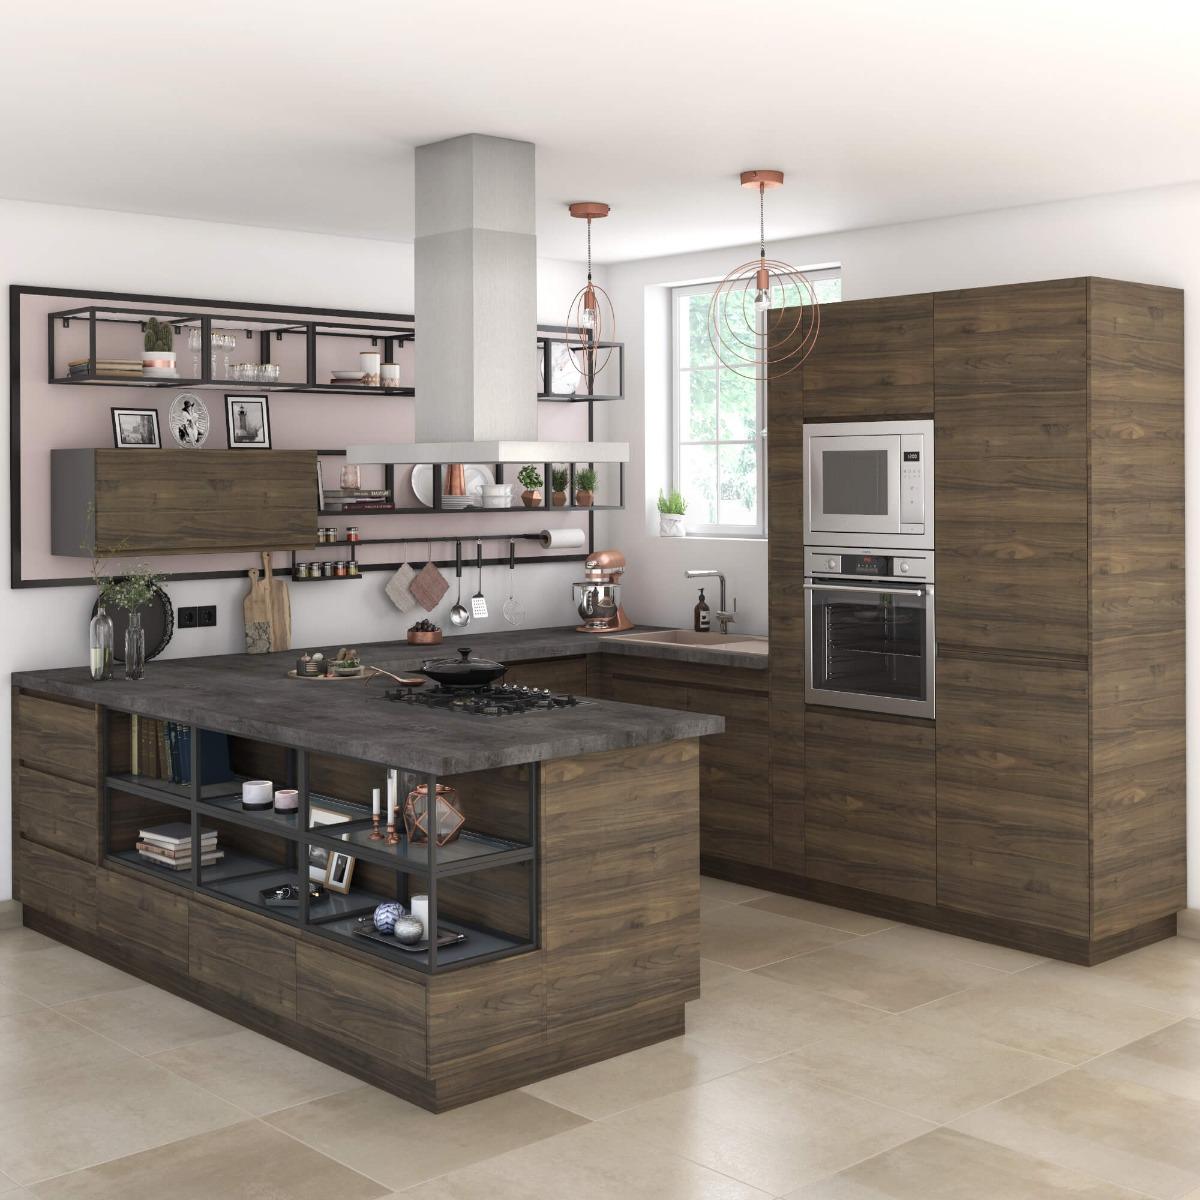 Delinia Tokyo Walnut Designer Kitchen Mobi - Example 1